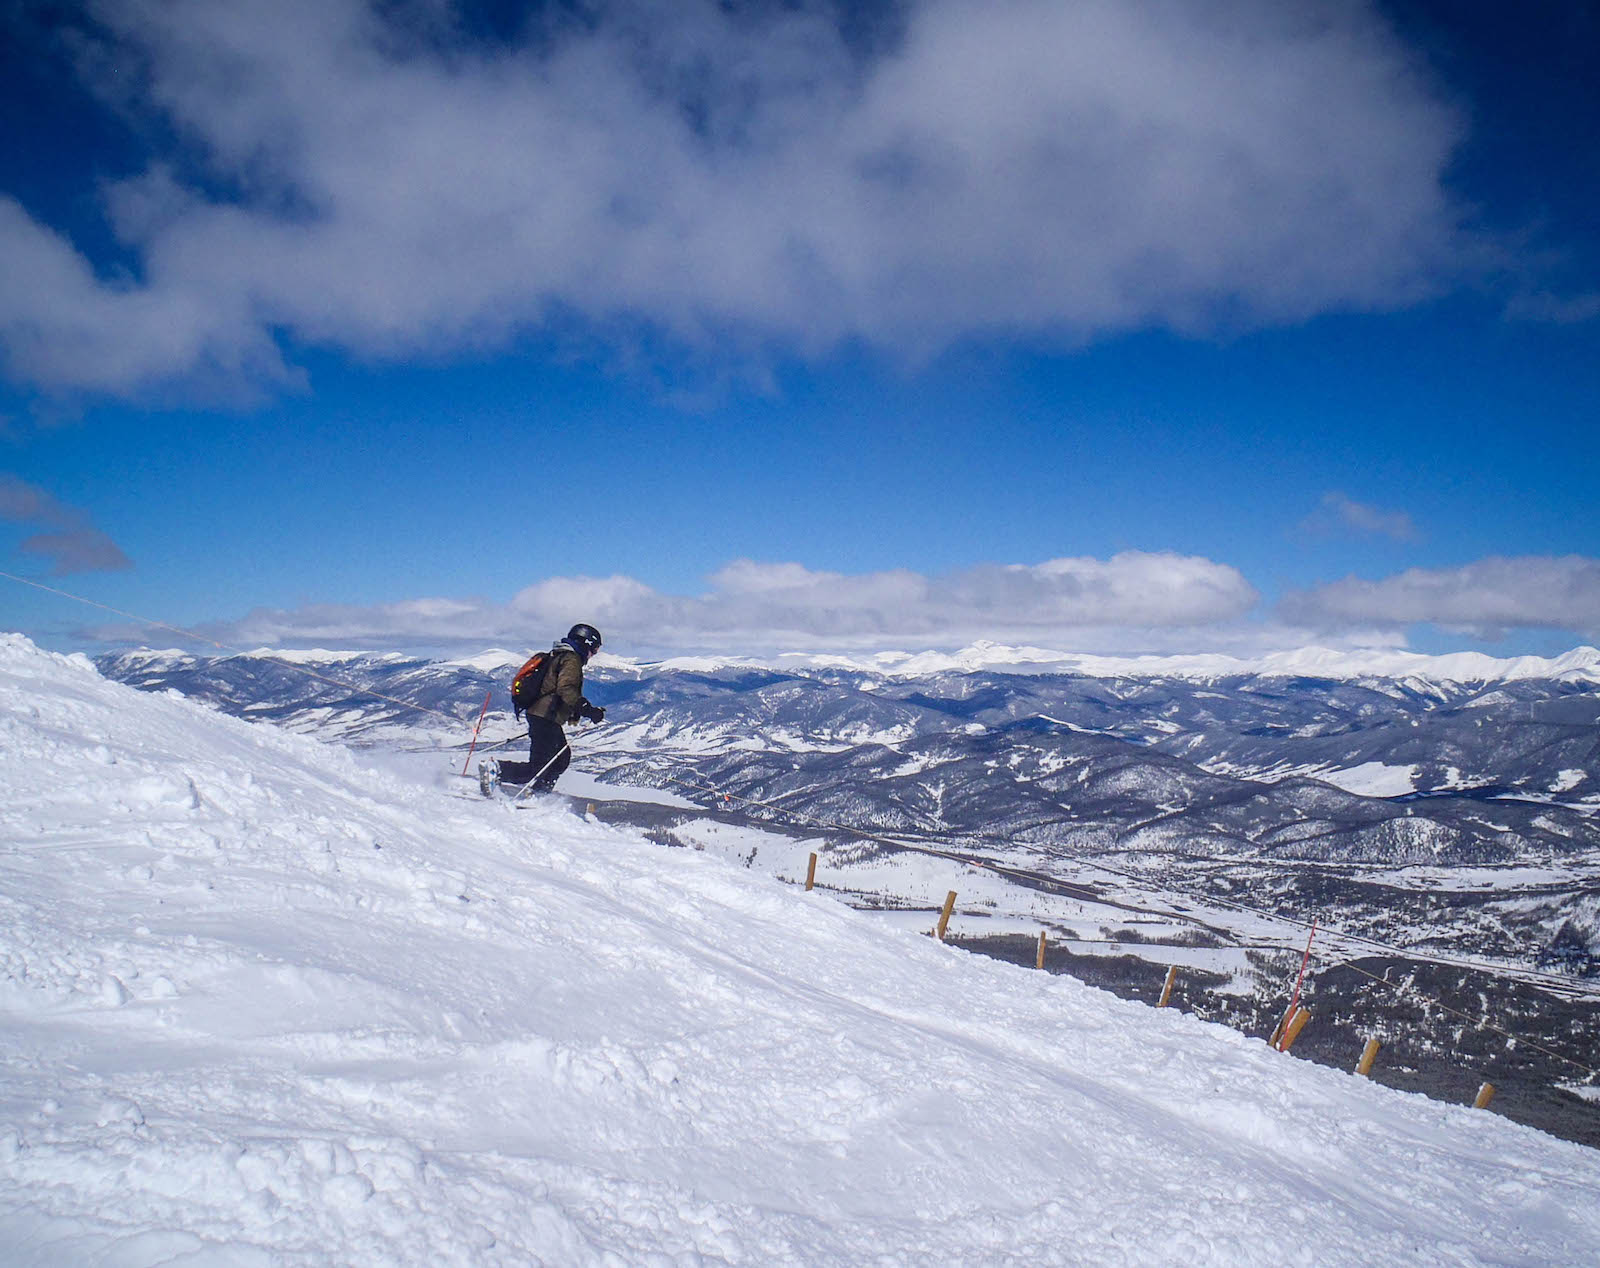 Skiing at Breckenridge, CO